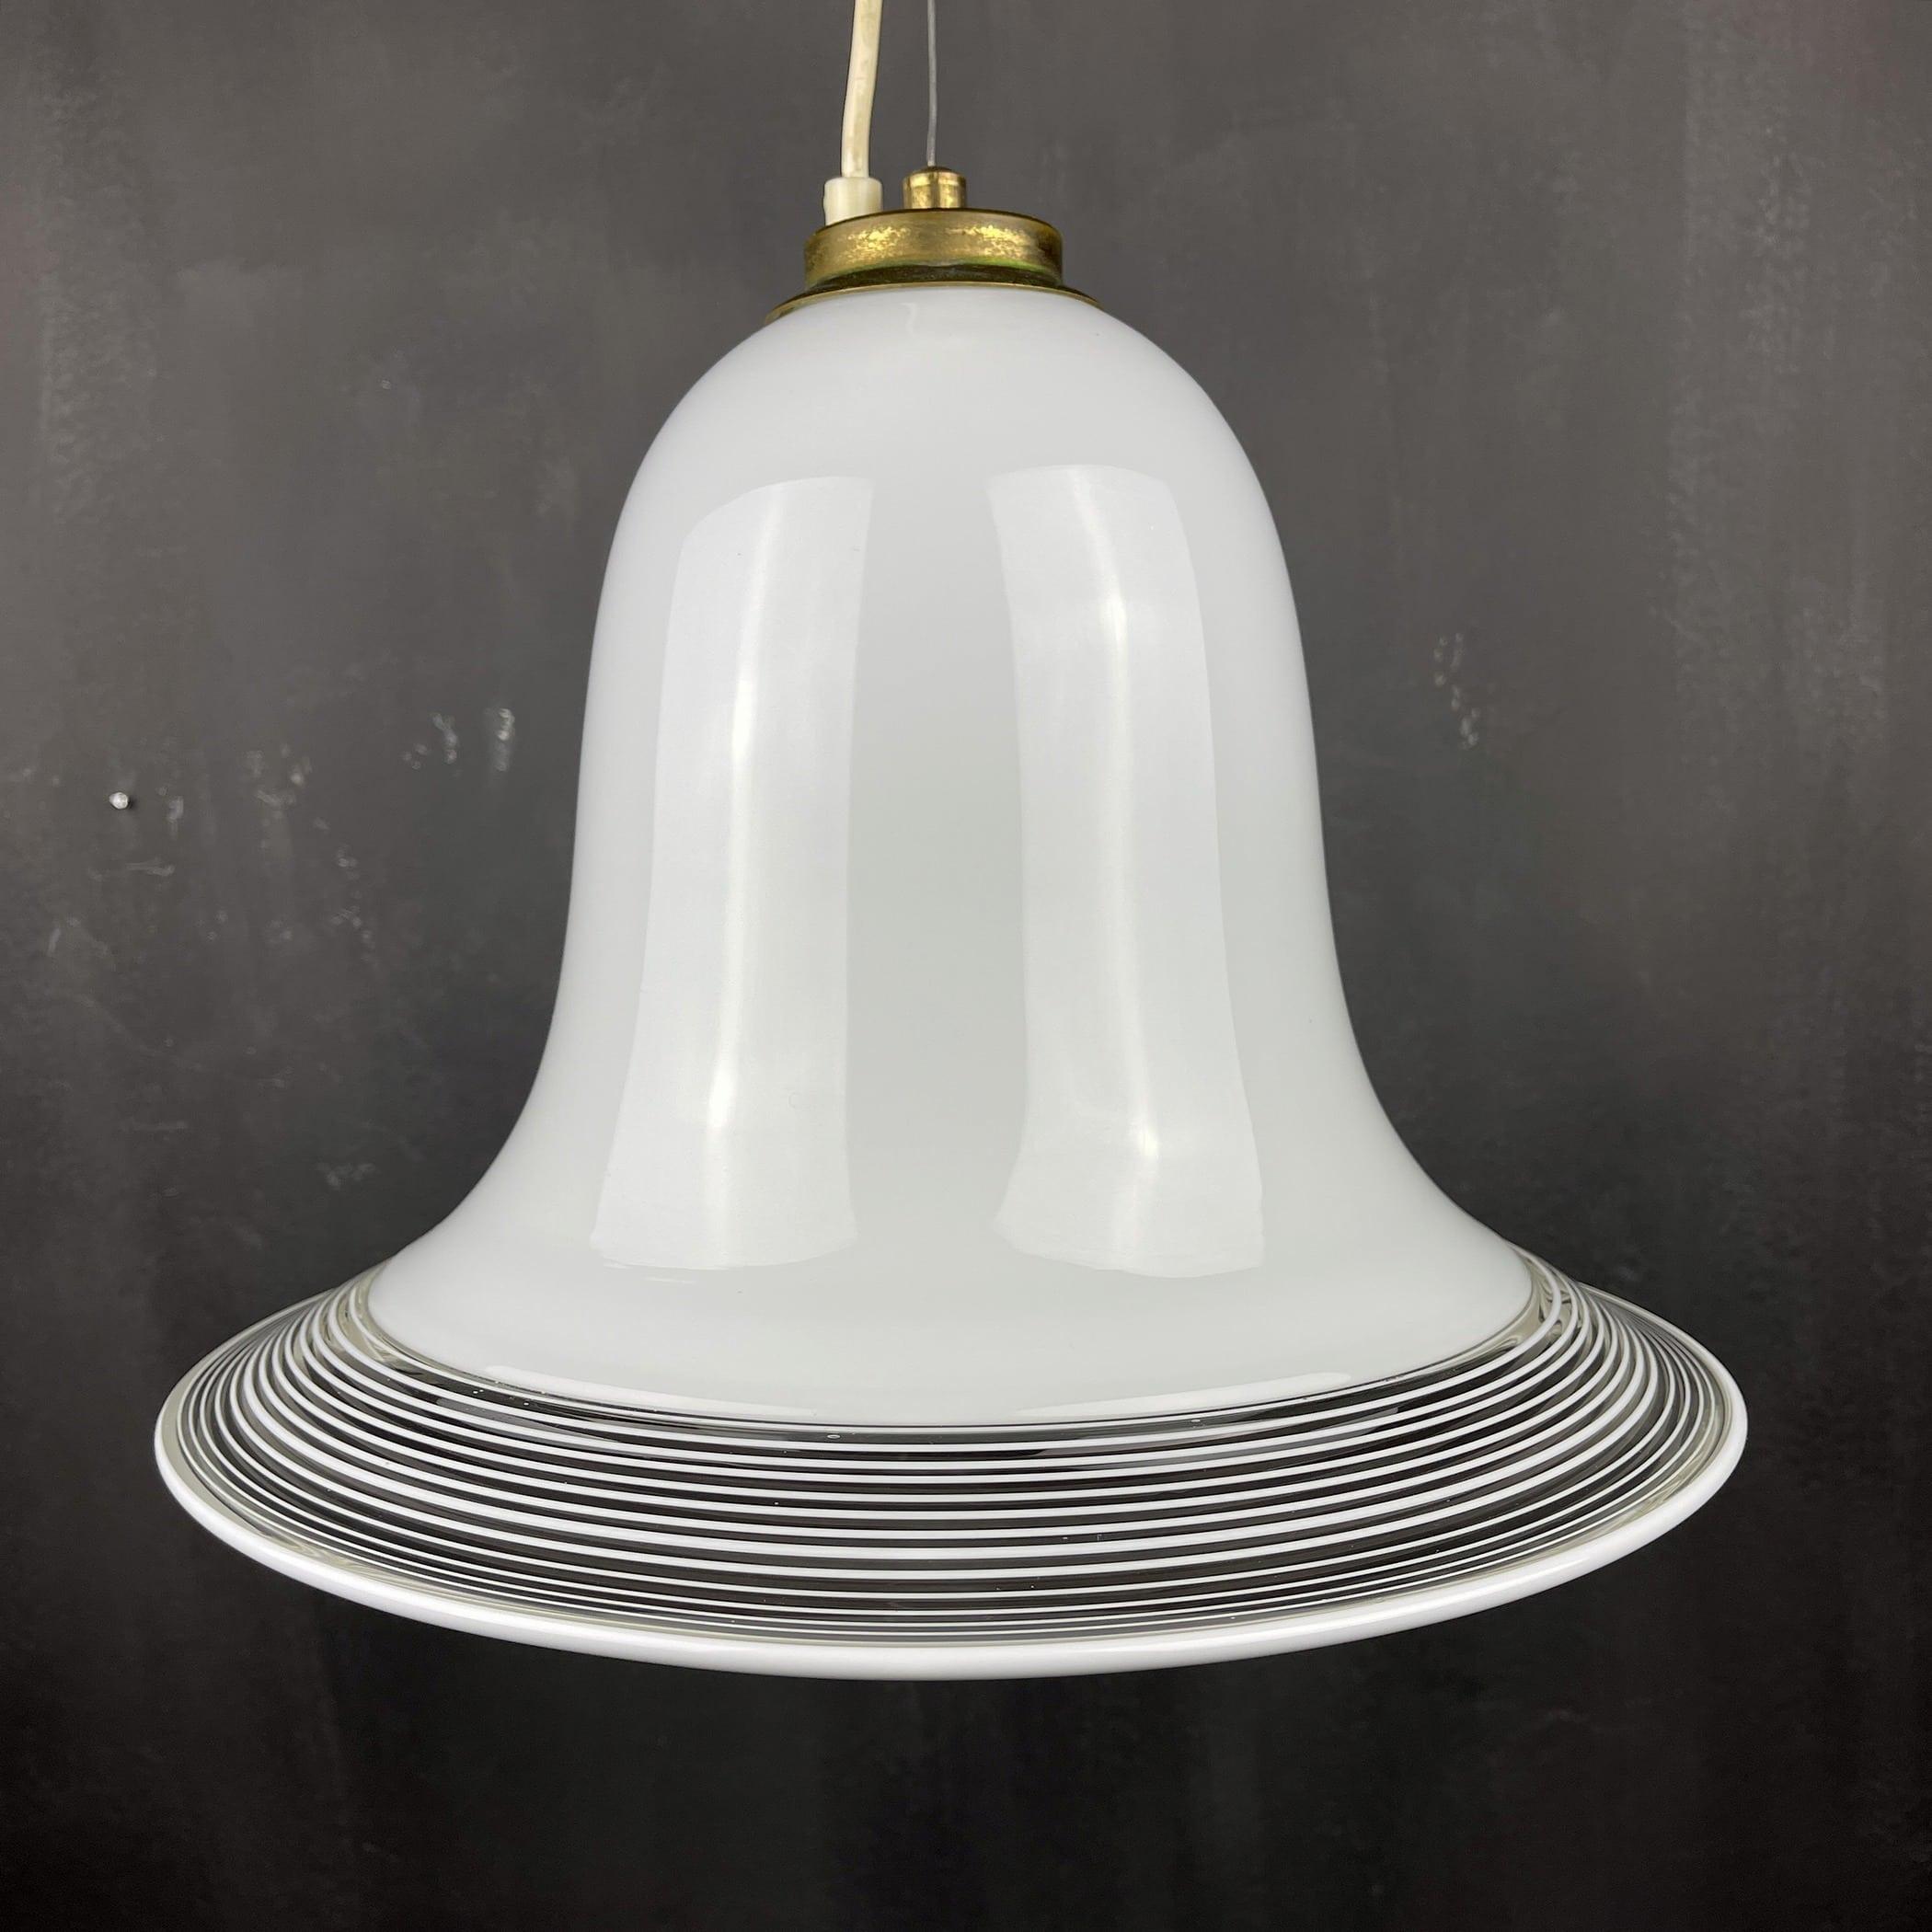 Vintage white murano chandelier Italy 1970s mid-century italian murano light